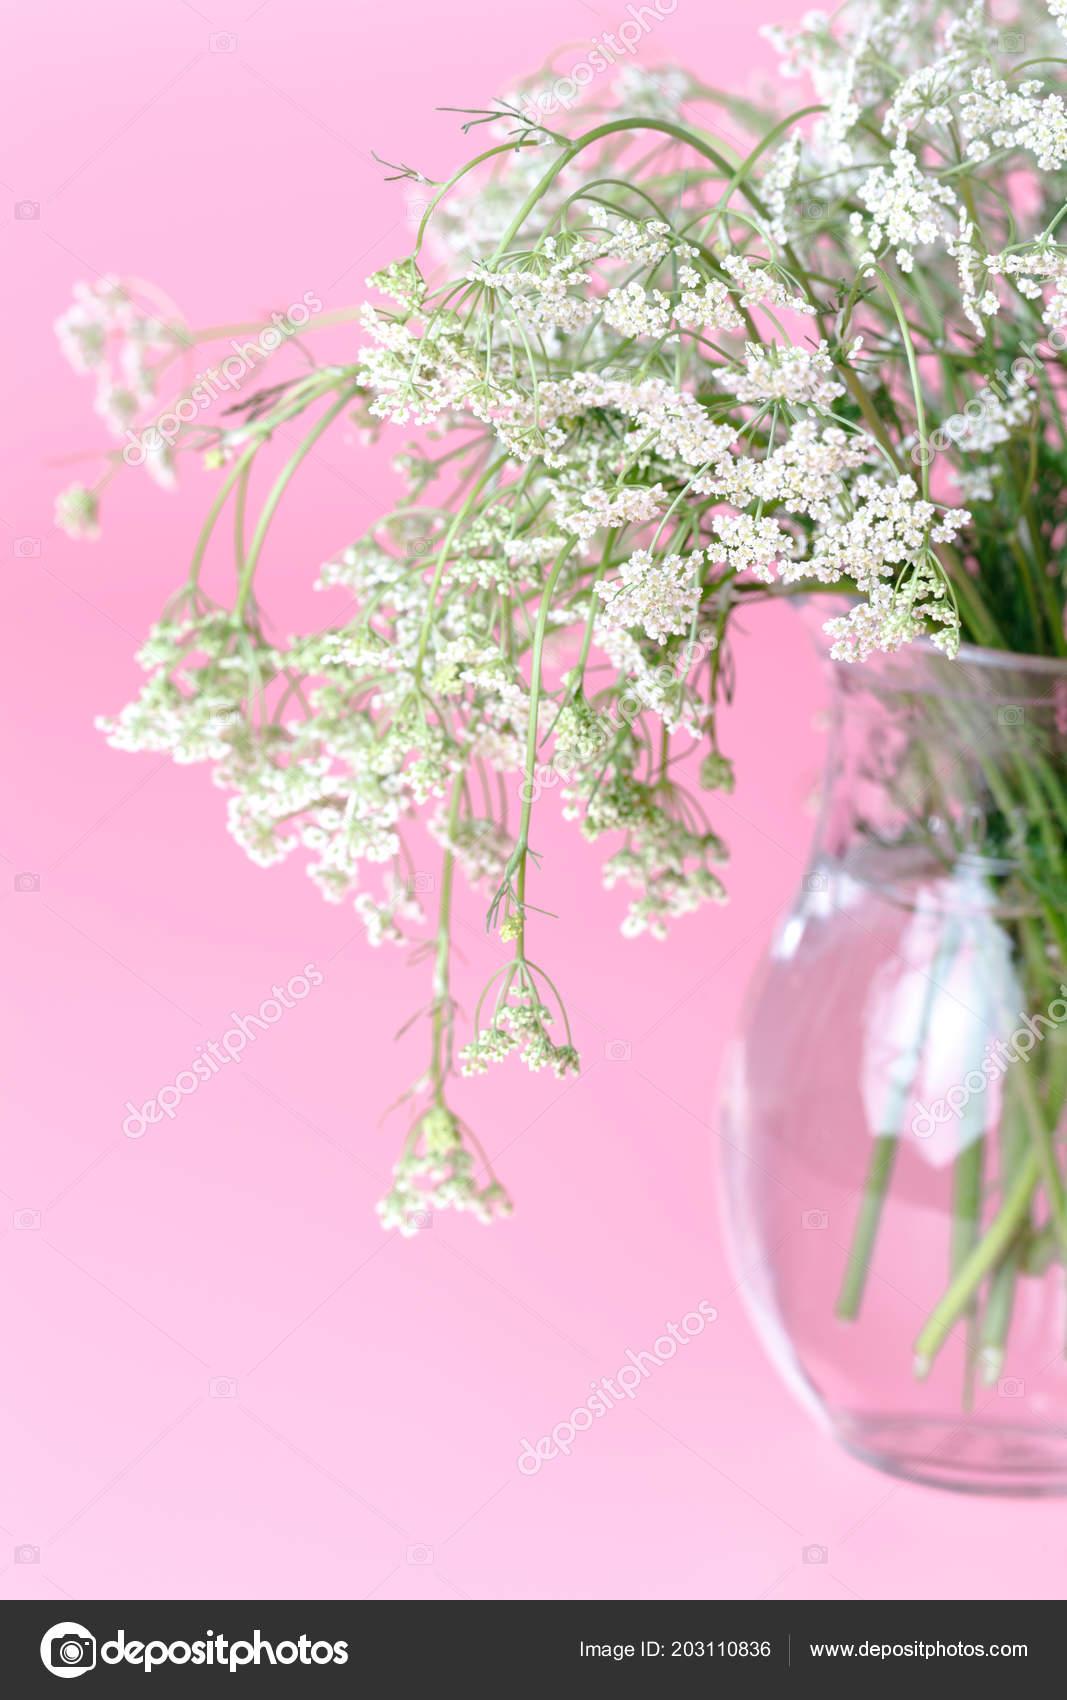 Small fragrant spring flowers stock photo andreycherkasov 203110836 small fragrant spring flowers stock photo mightylinksfo